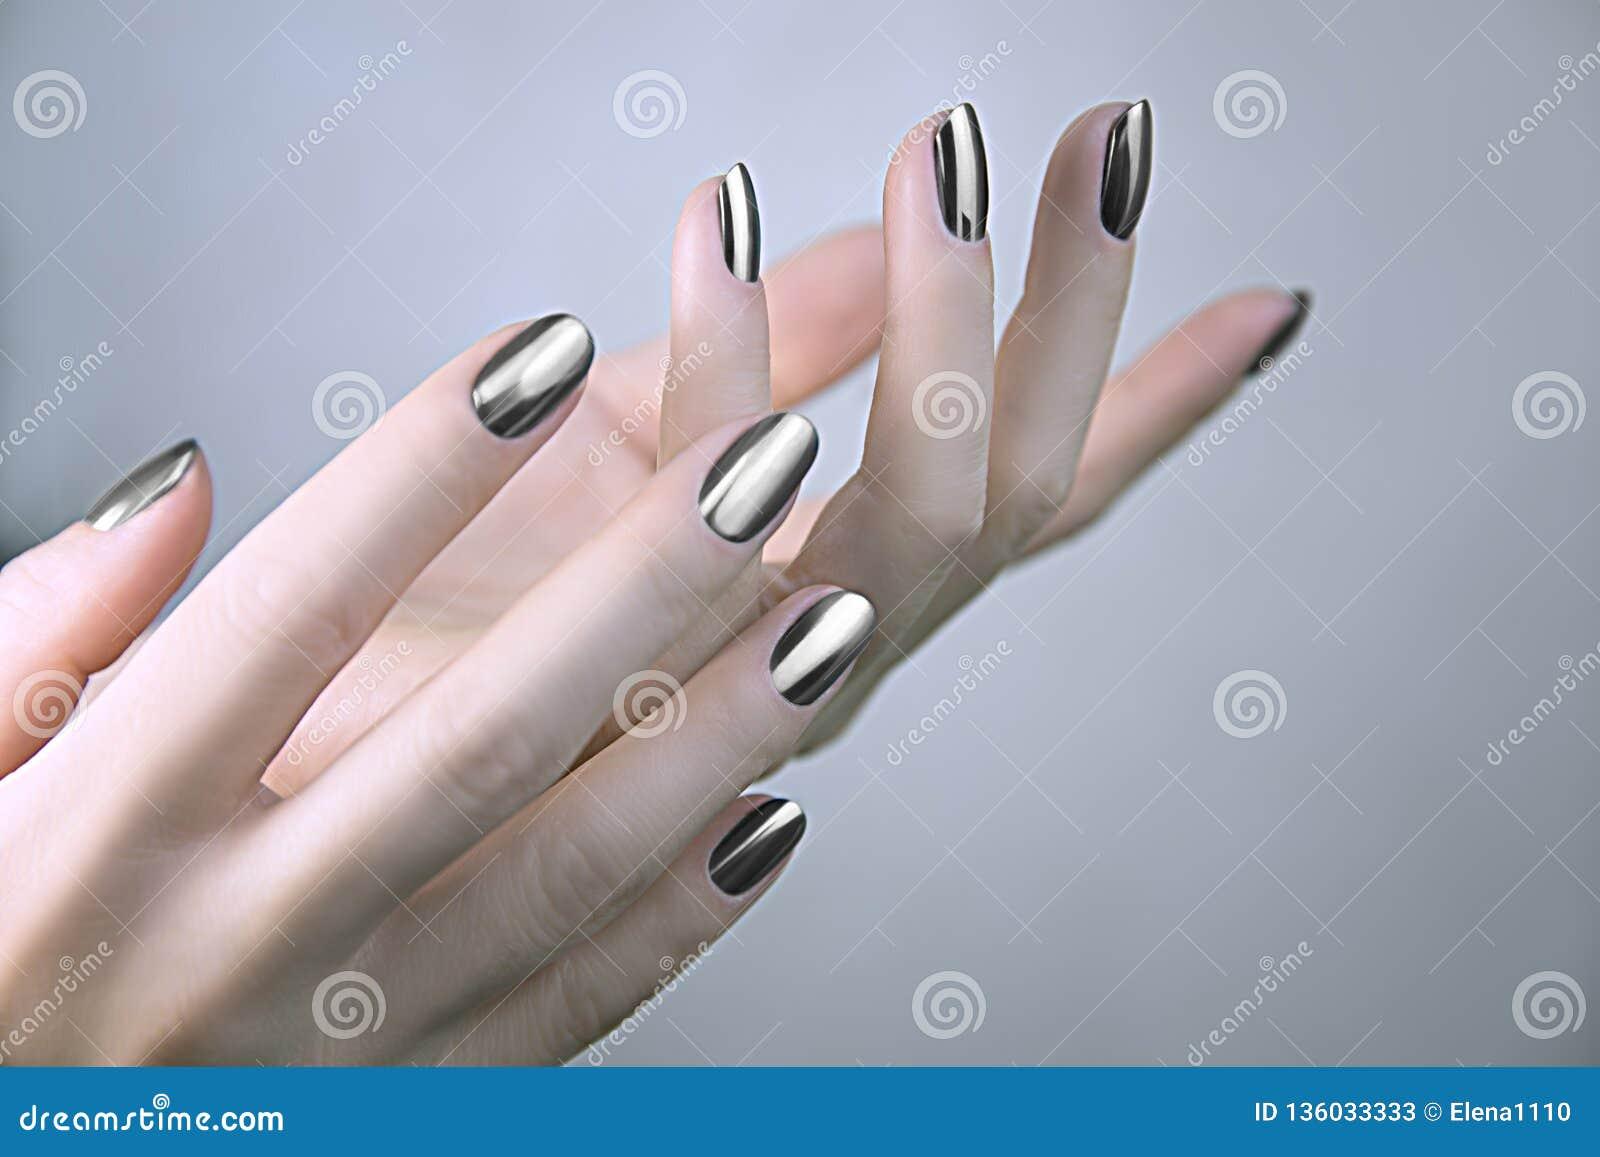 Elegancki modny żeński manicure